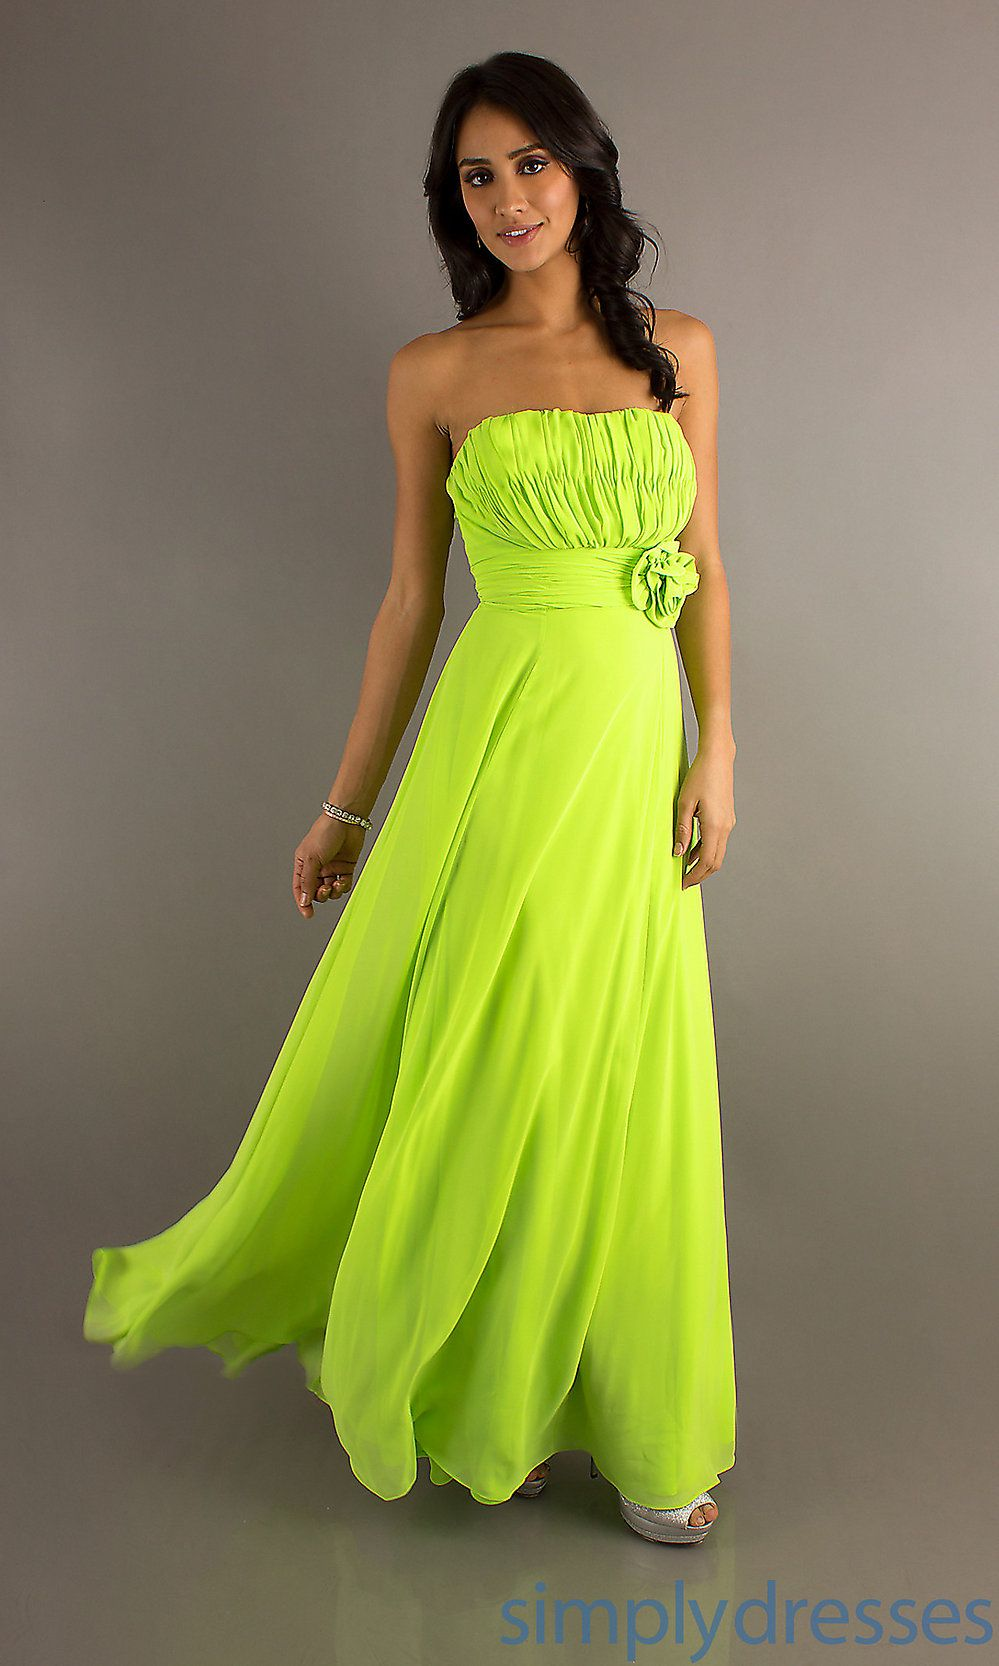 Floor length strapless dress cheap prom dresses simply dresses neon junior bridesmaid dress ombrellifo Images